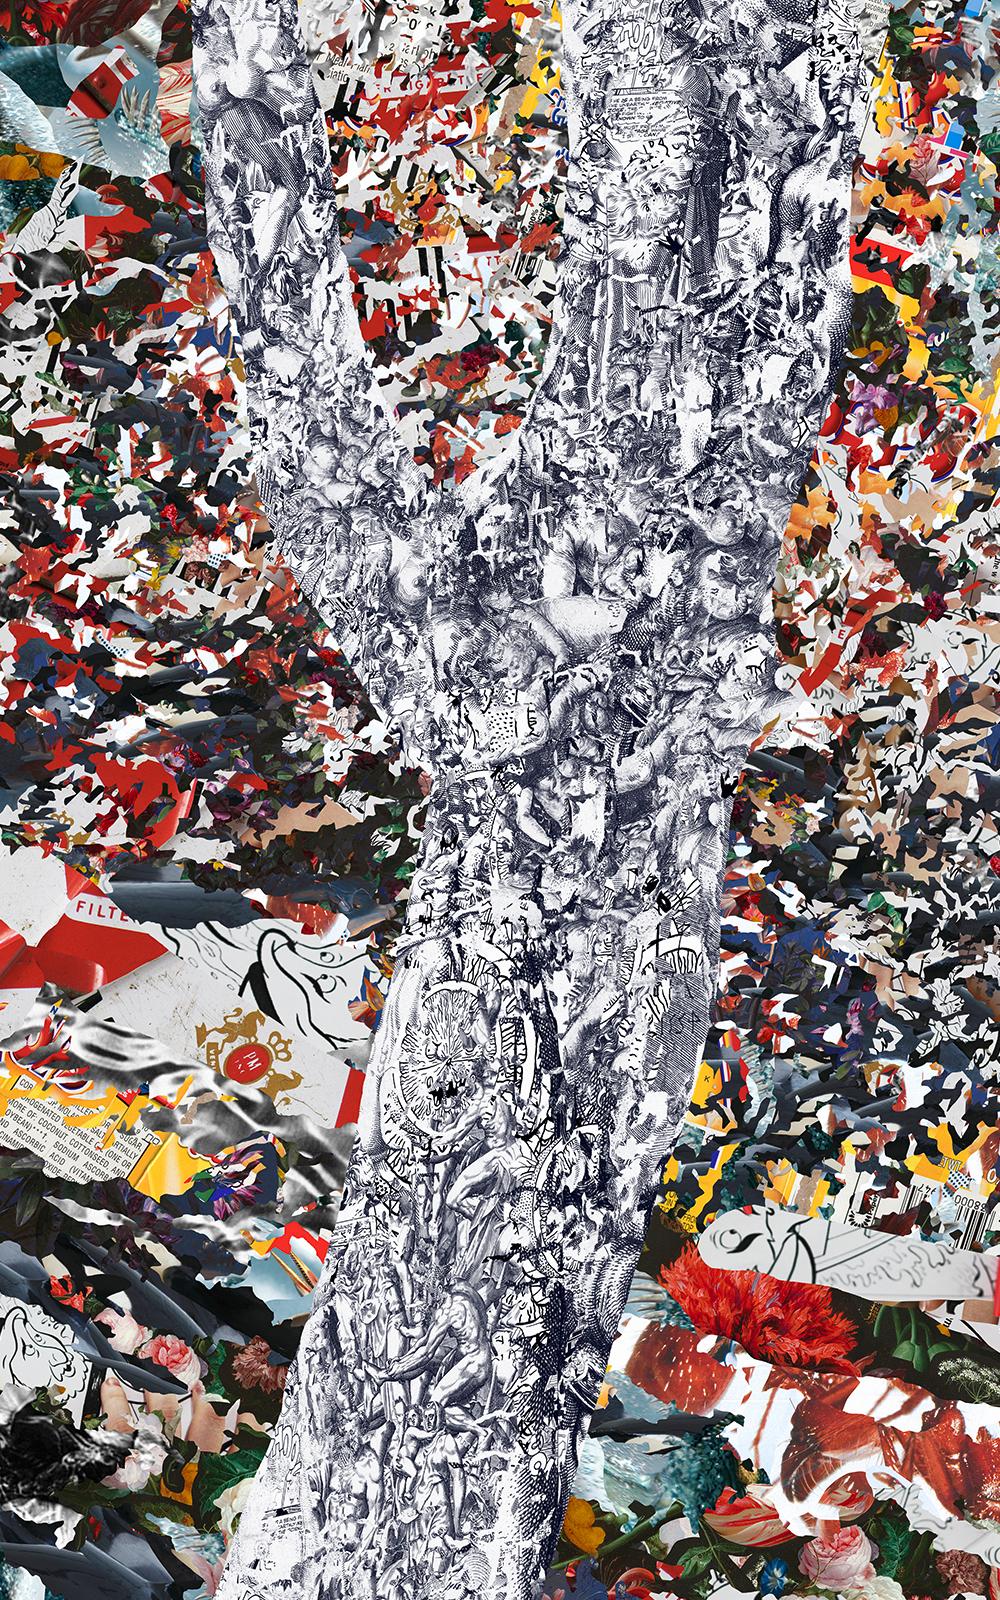 Case Simmons, Simmons & Burke, Cognac XO, Dutchmasters, Kohn Gallery,Pigment Print, Digital Collage,Digital Art, Photoshop Collage, Contemporary Collage, Photoshop Actions, Case Simmons Art, Collage Fine Art, Digital Landscape